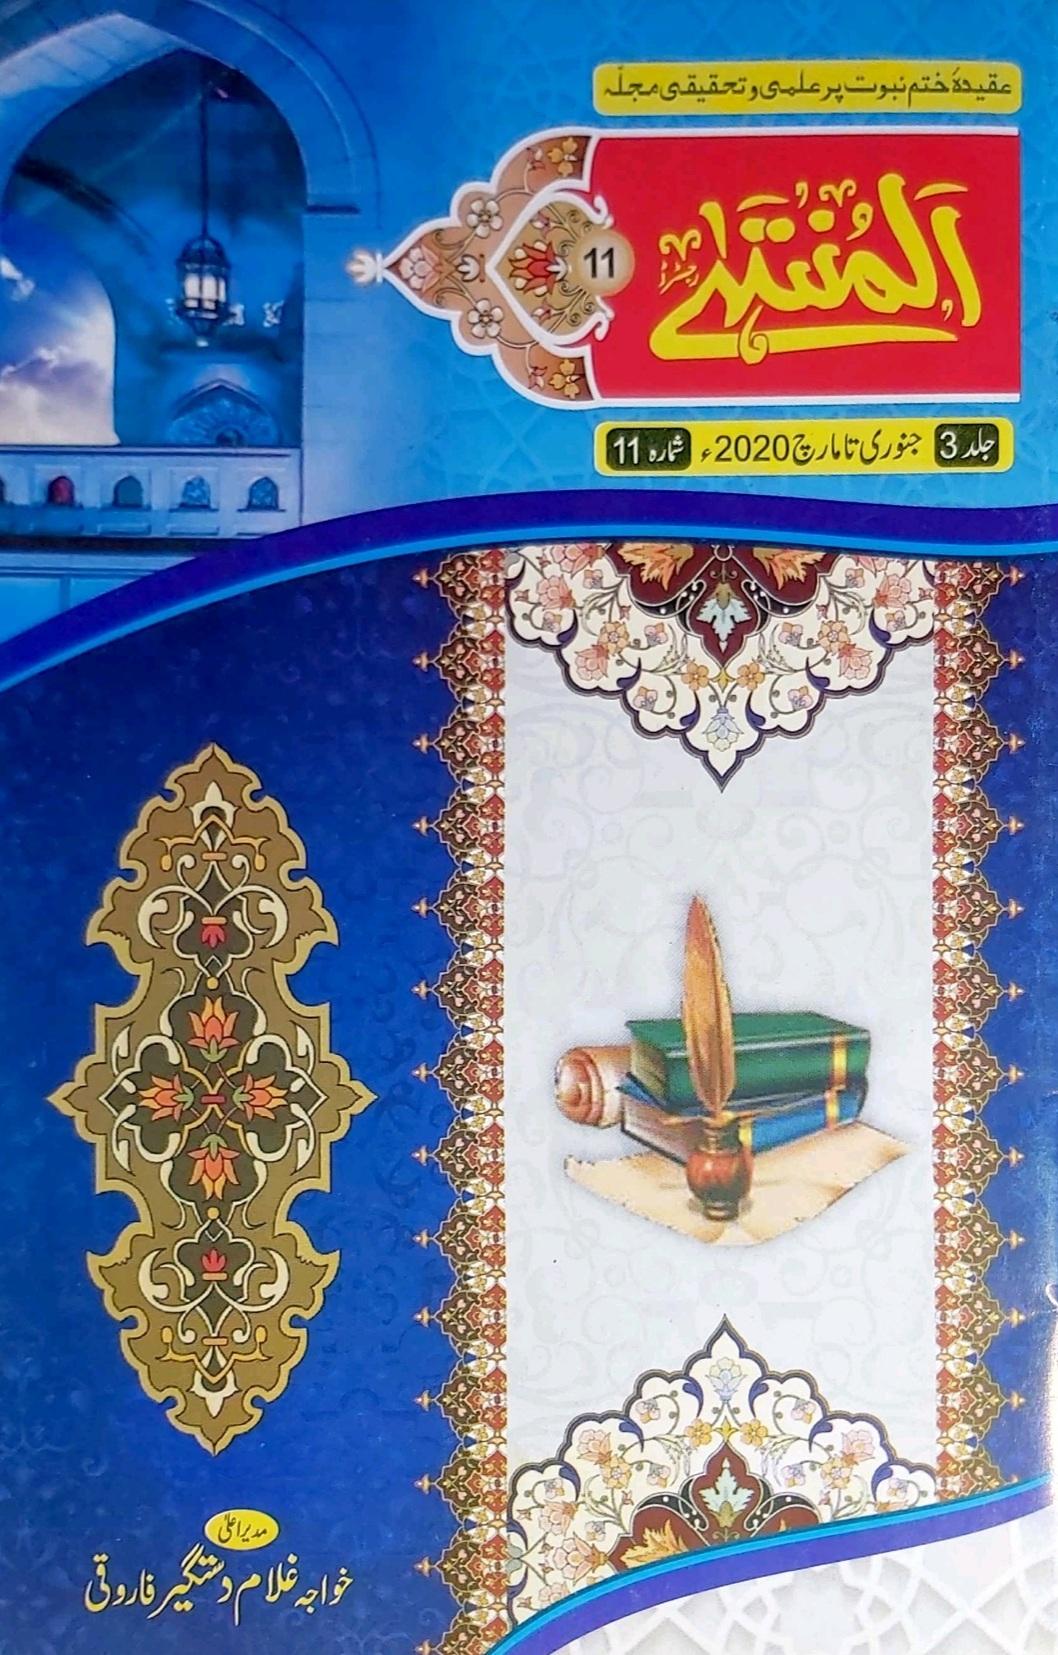 Al Muntahaa Shumarah # 11 / المنتہی المنتھی شمارہ # 11 by خواجہ غلام دستگیر فاروقی